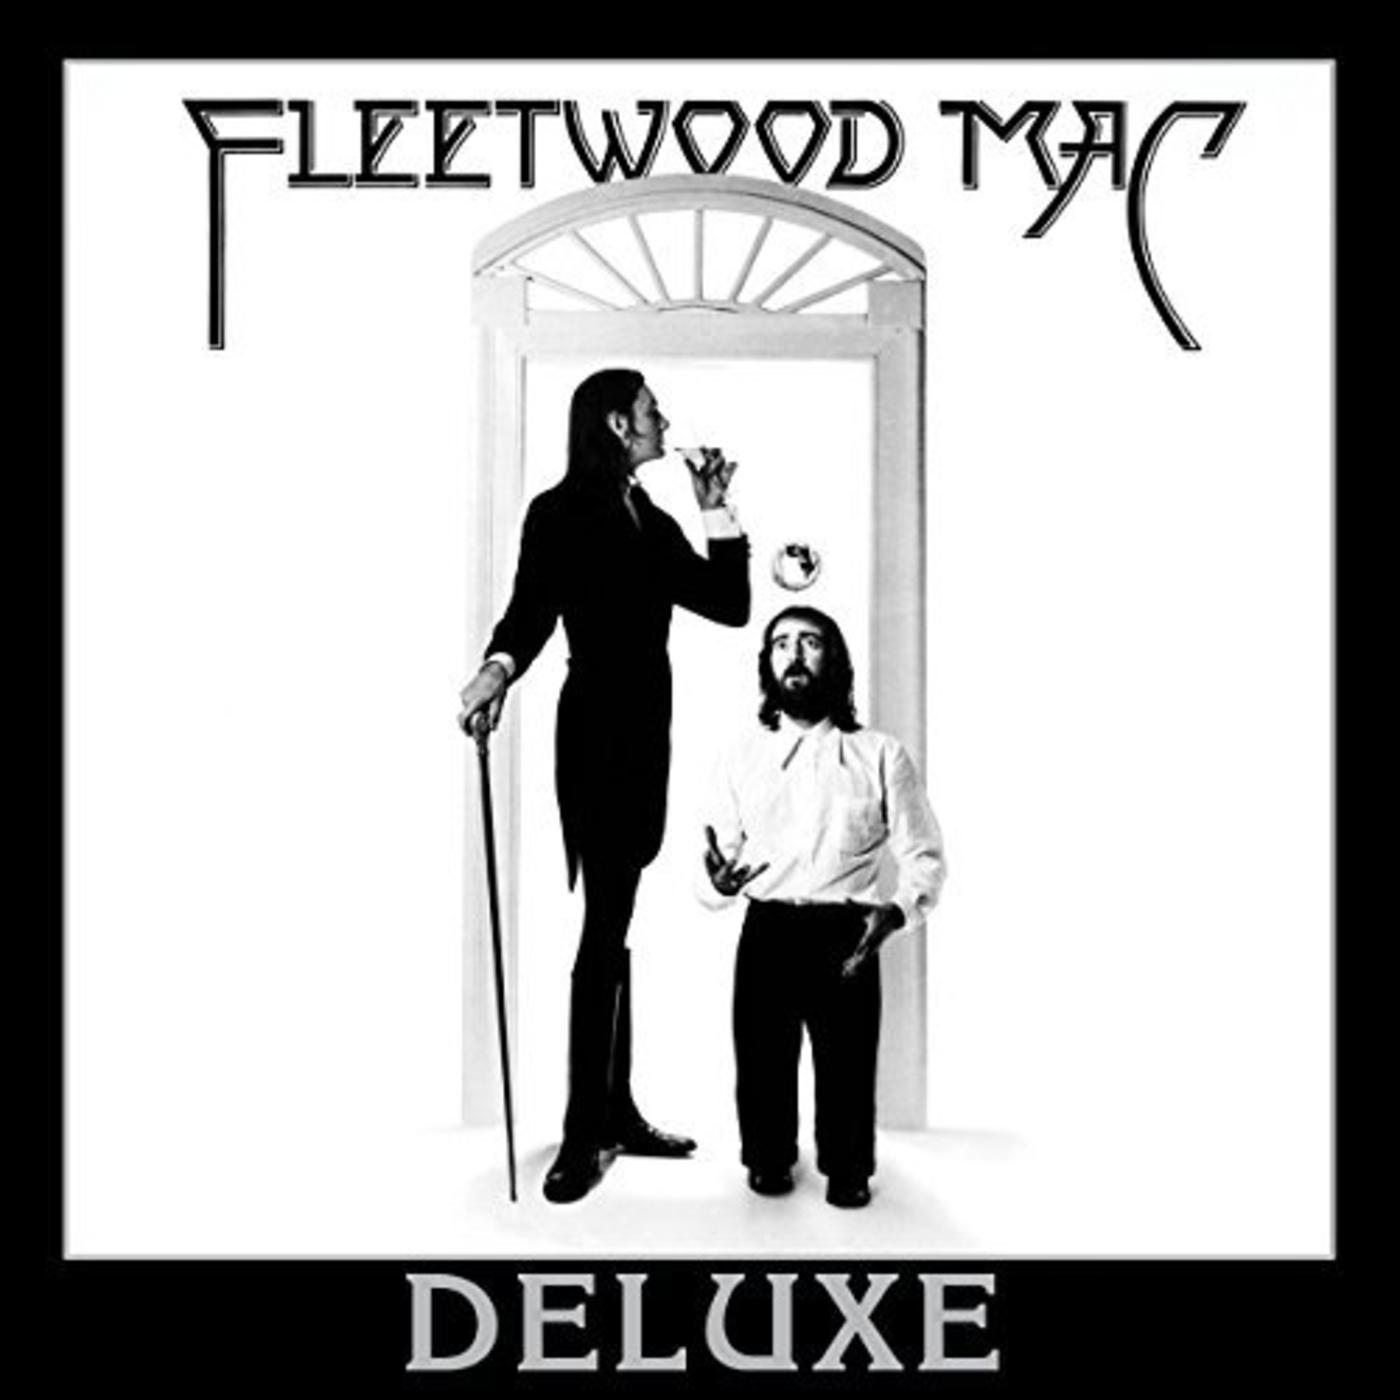 Fleetwood Mac | Rhino on